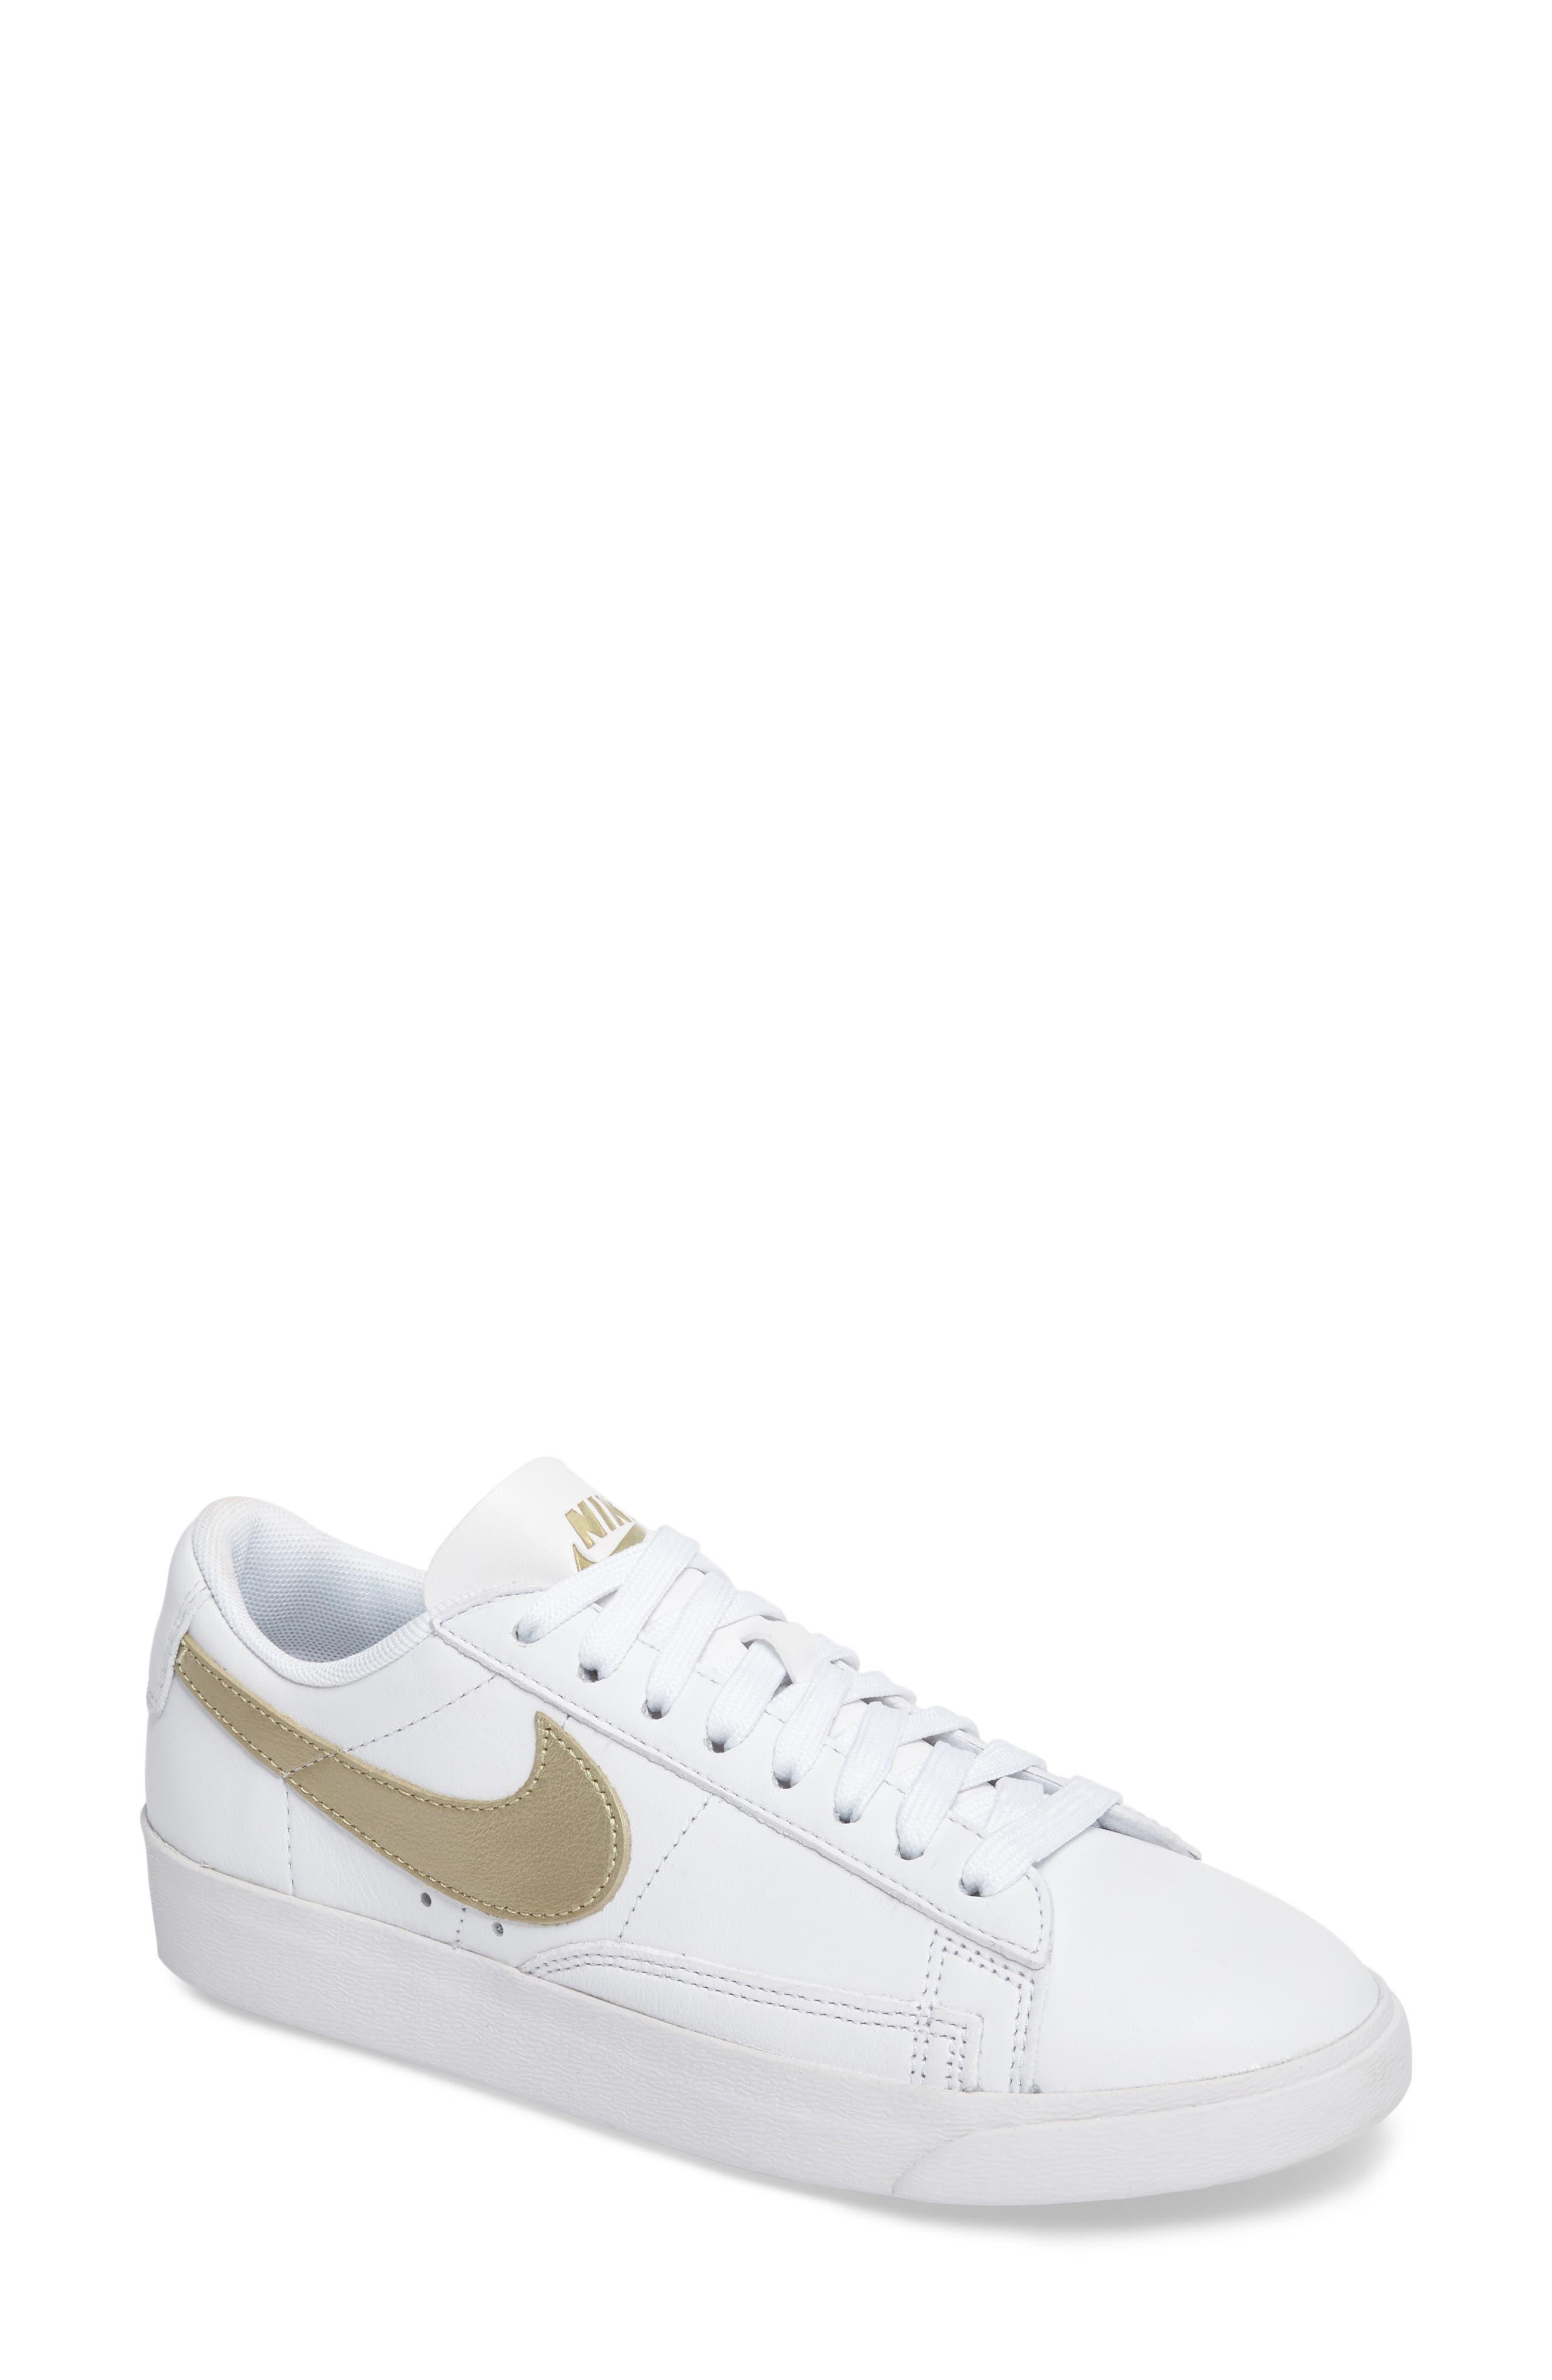 Alternate Image 1 Selected - Nike Blazer Low LE Basketball Shoe (Women)